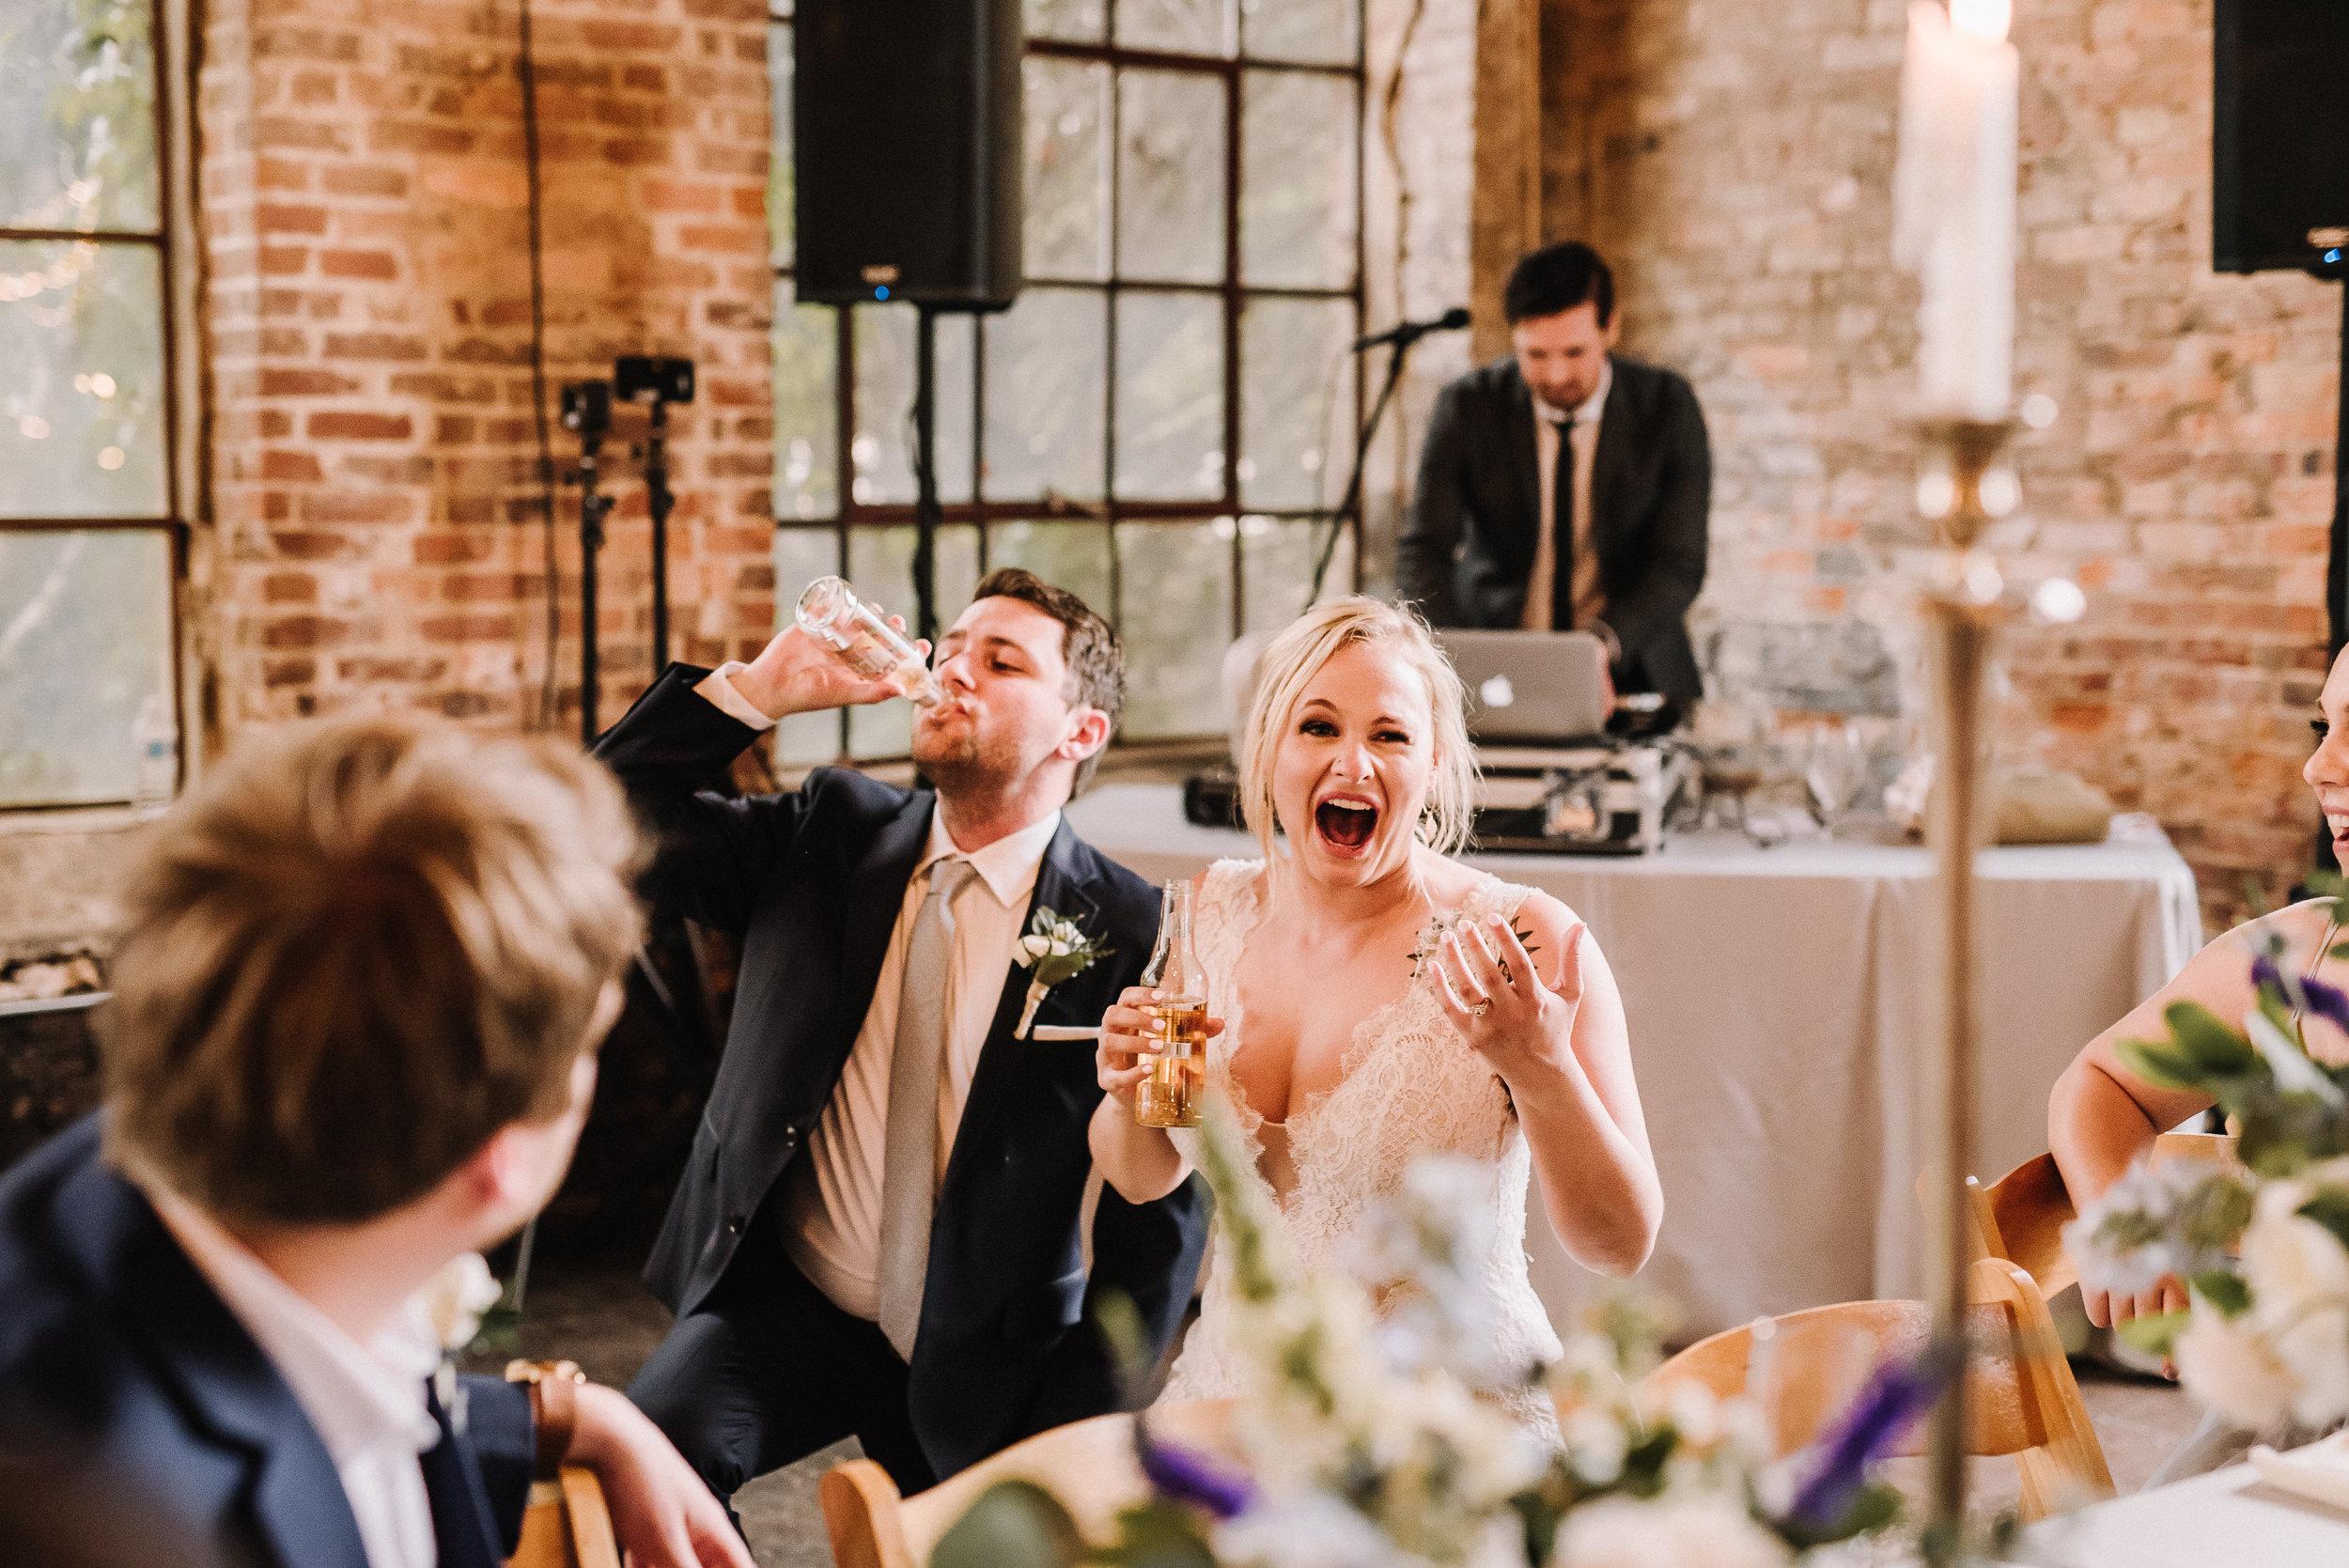 Morgan Wedding_Mill at Yellow River_Ashley Benham Photography-1033.jpg